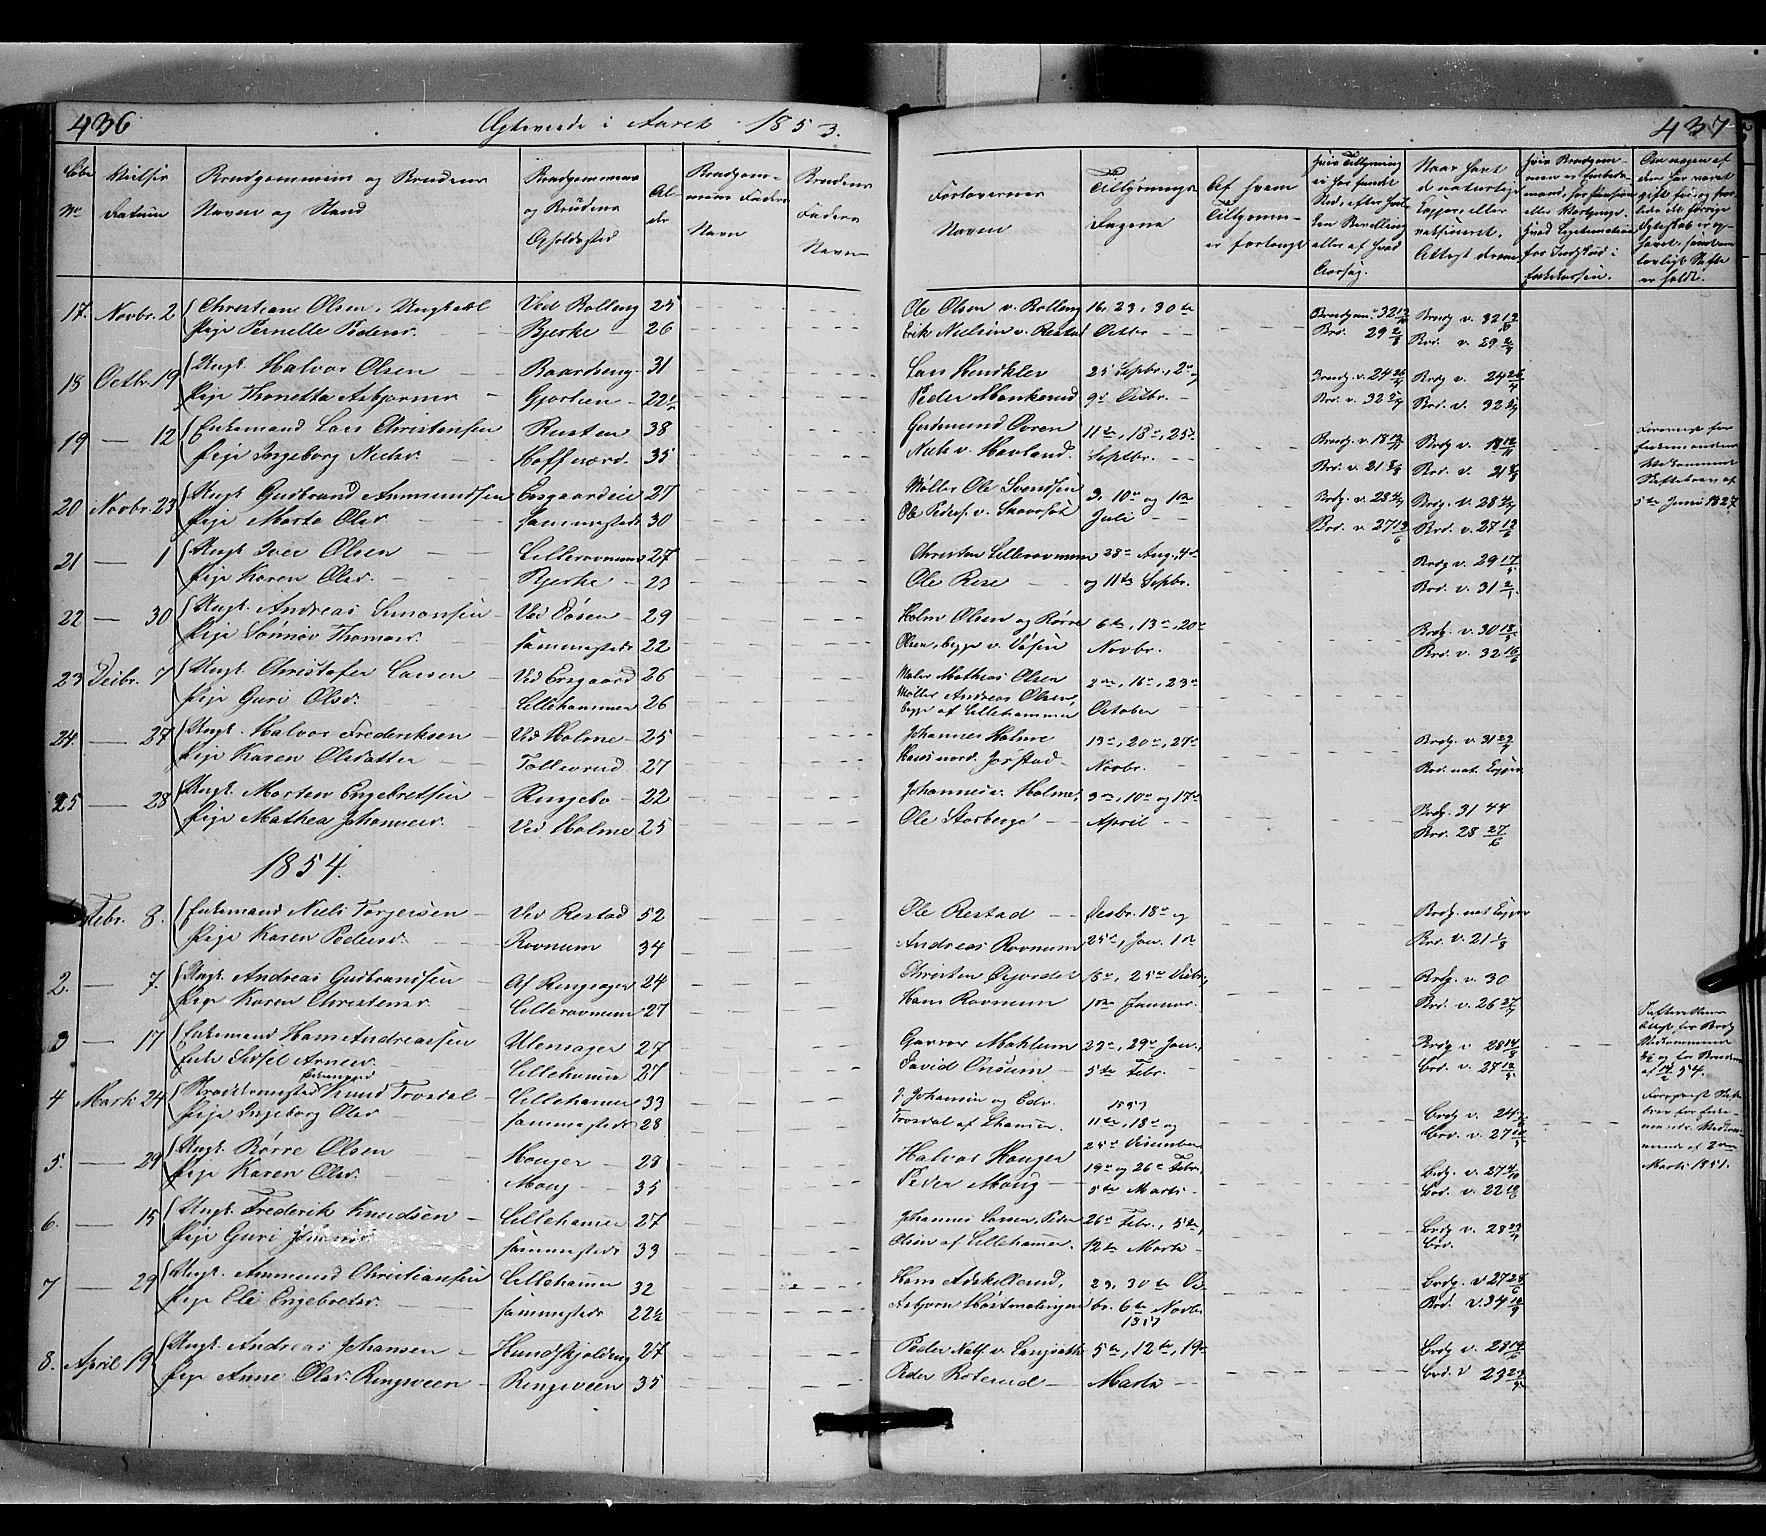 SAH, Fåberg prestekontor, Klokkerbok nr. 6, 1837-1855, s. 436-437